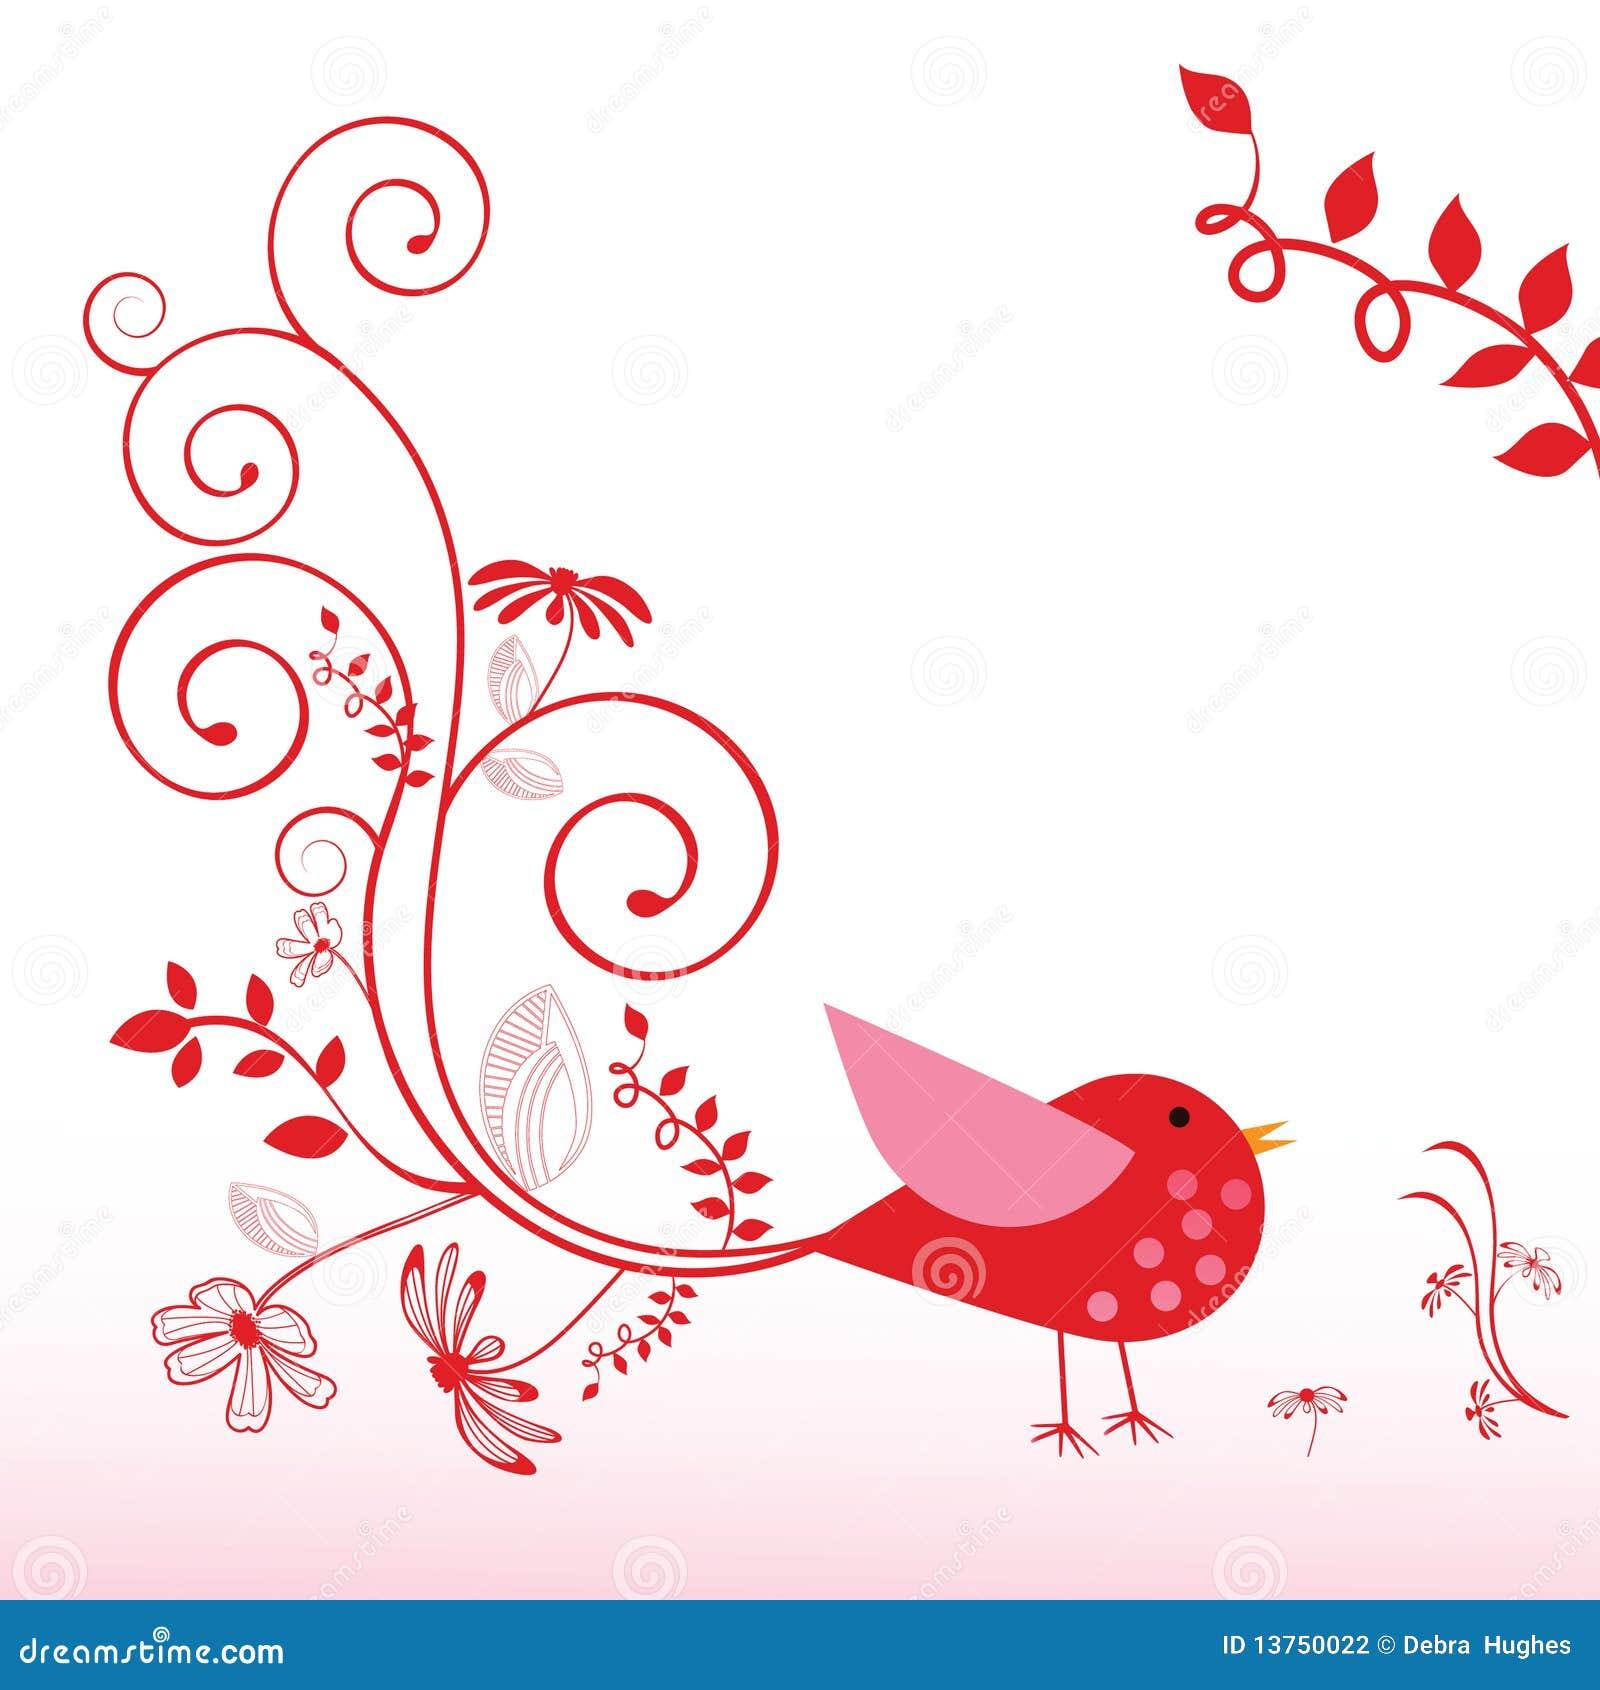 Whimsical Bird Decorative Elements Happy